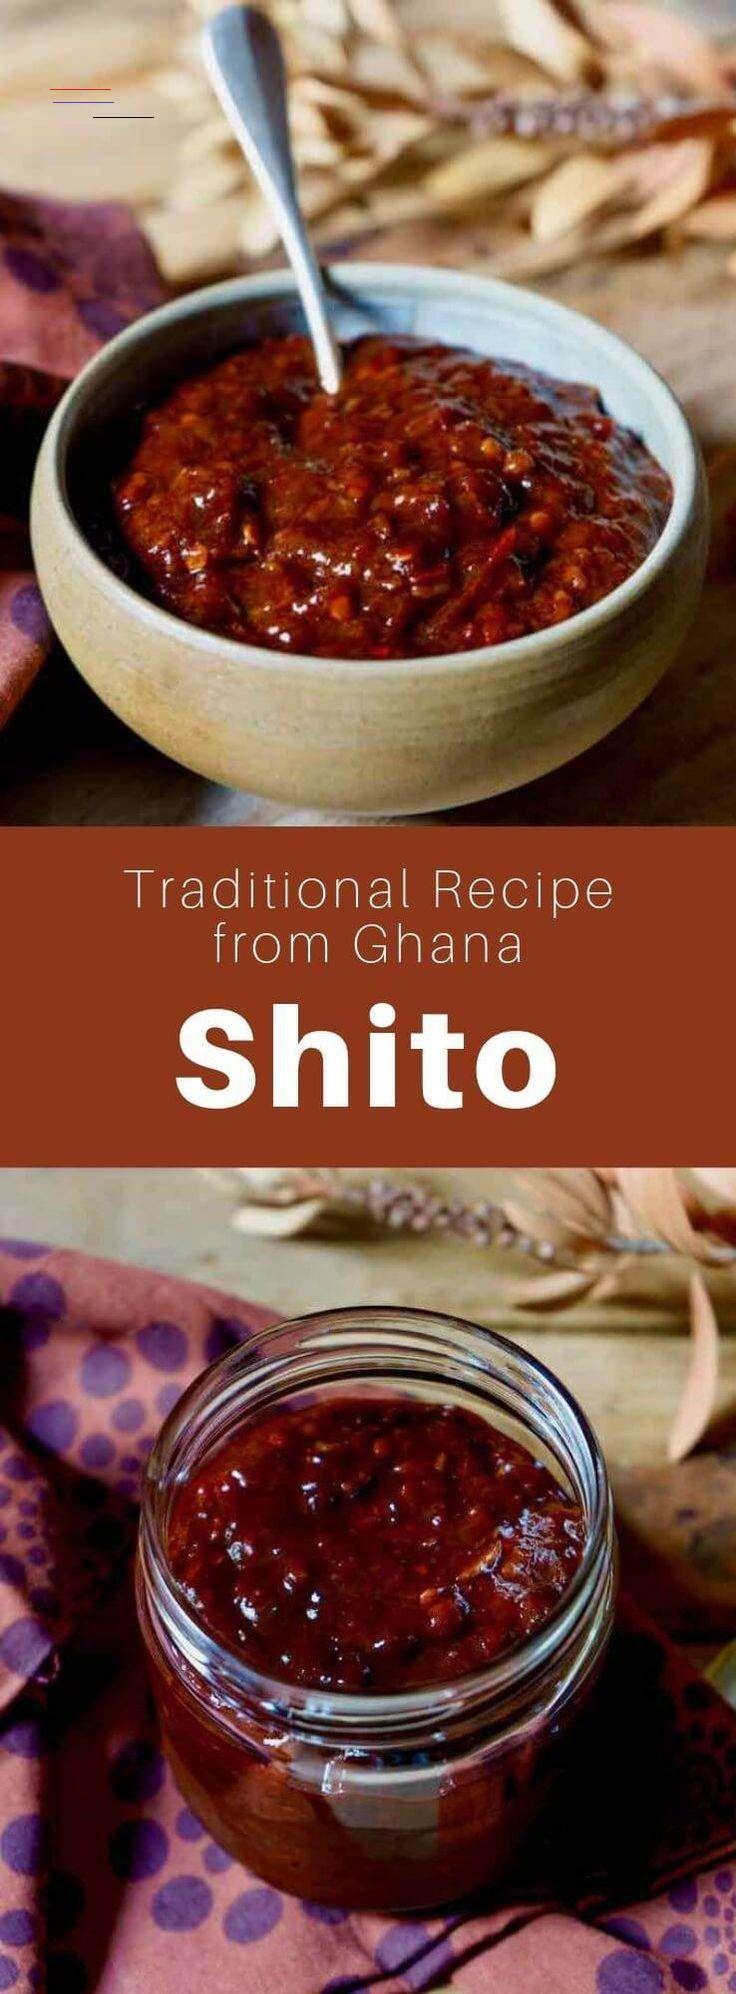 Ghana shito in 2020 ghanaian food african food recipes